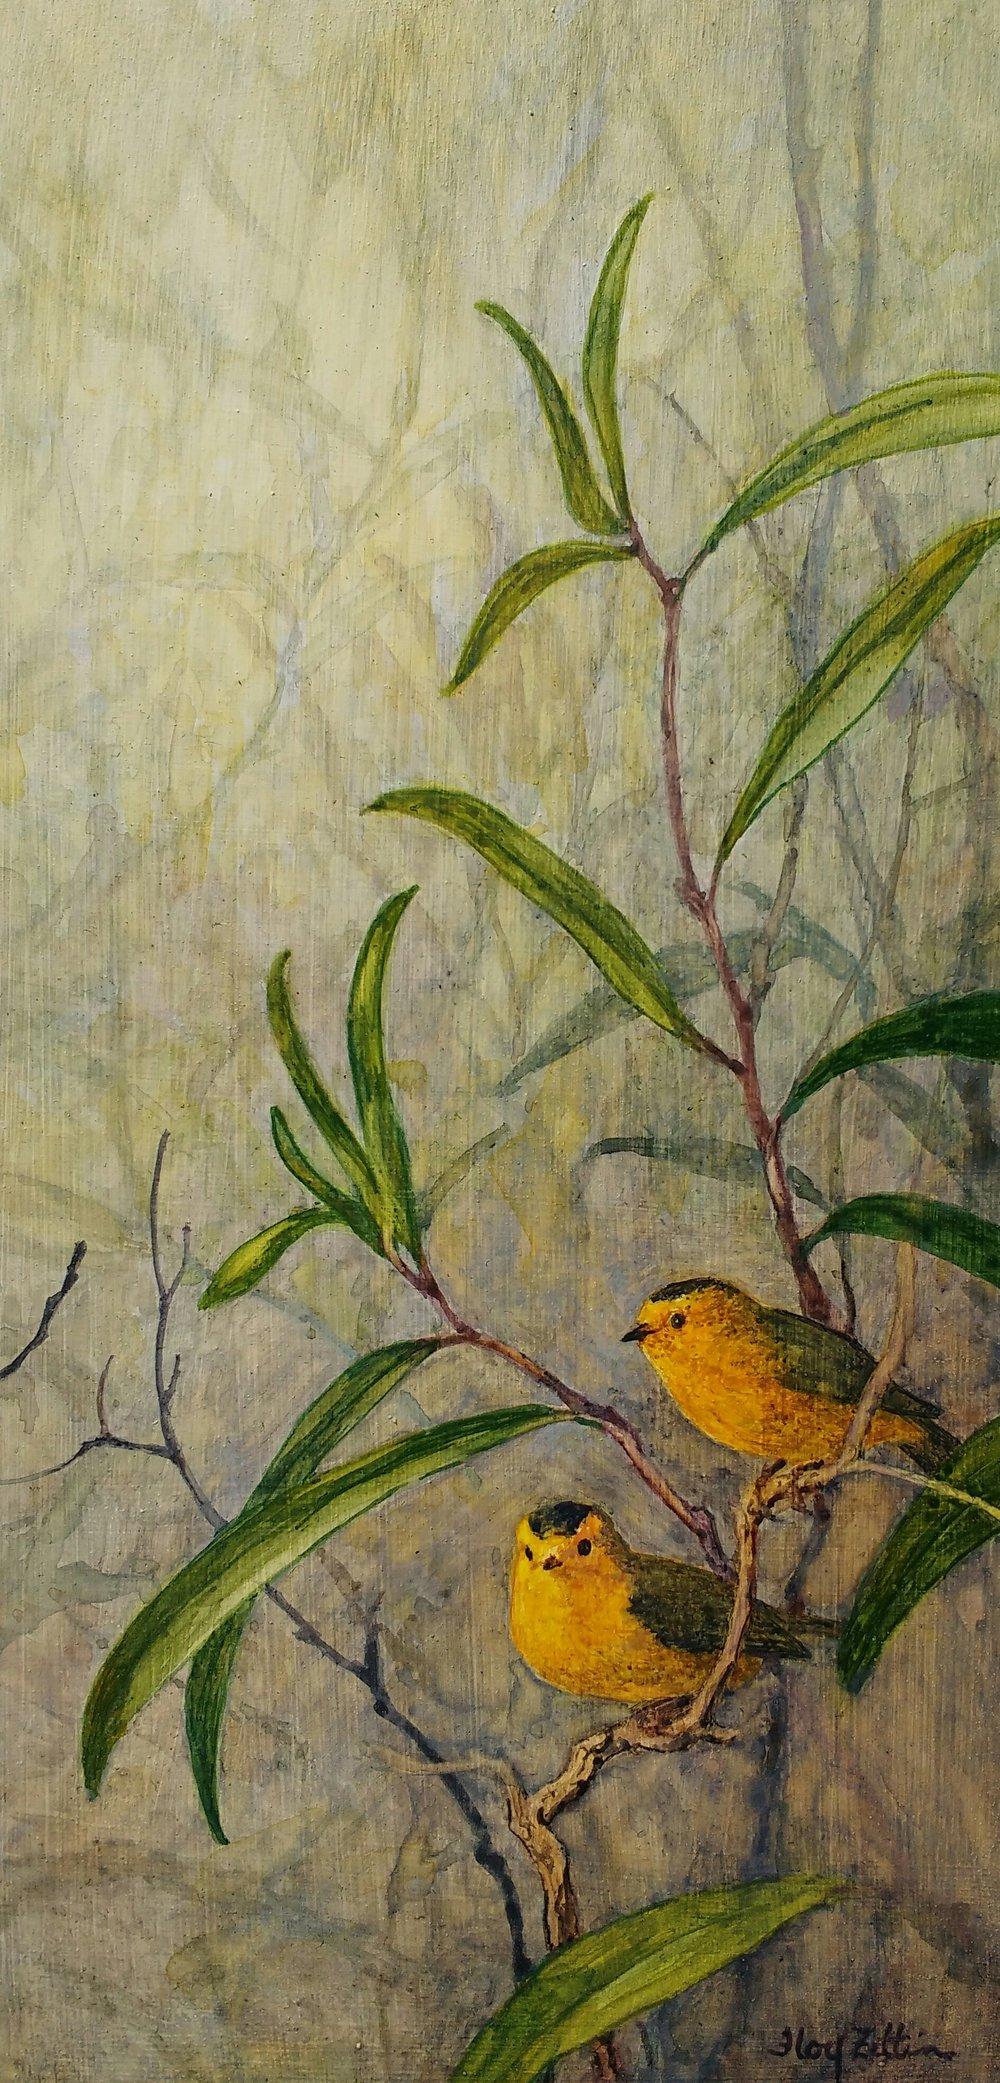 "Wilson's Warblers 12"" x 6"" watercolor on wood panel 2107"